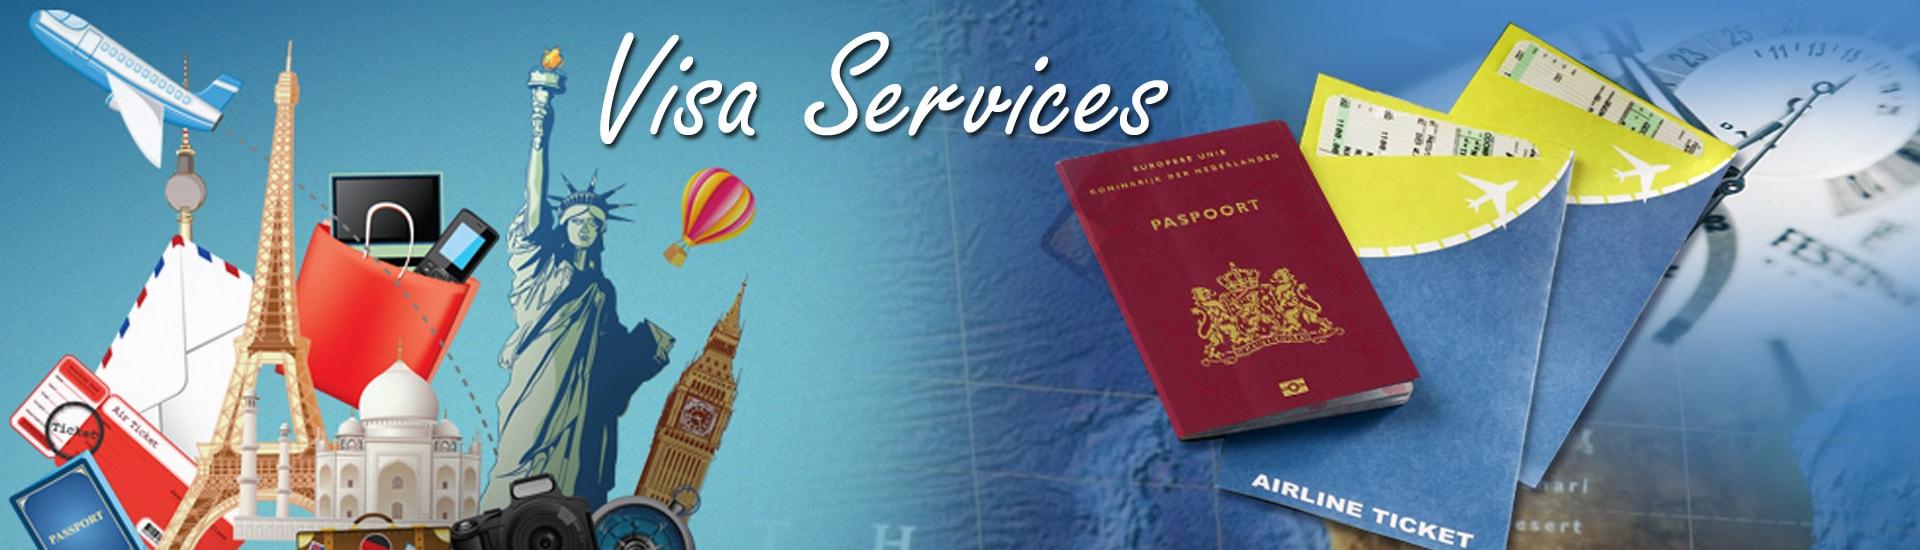 Europe visa service providers travel visa consultancy service for europe visa service thecheapjerseys Images